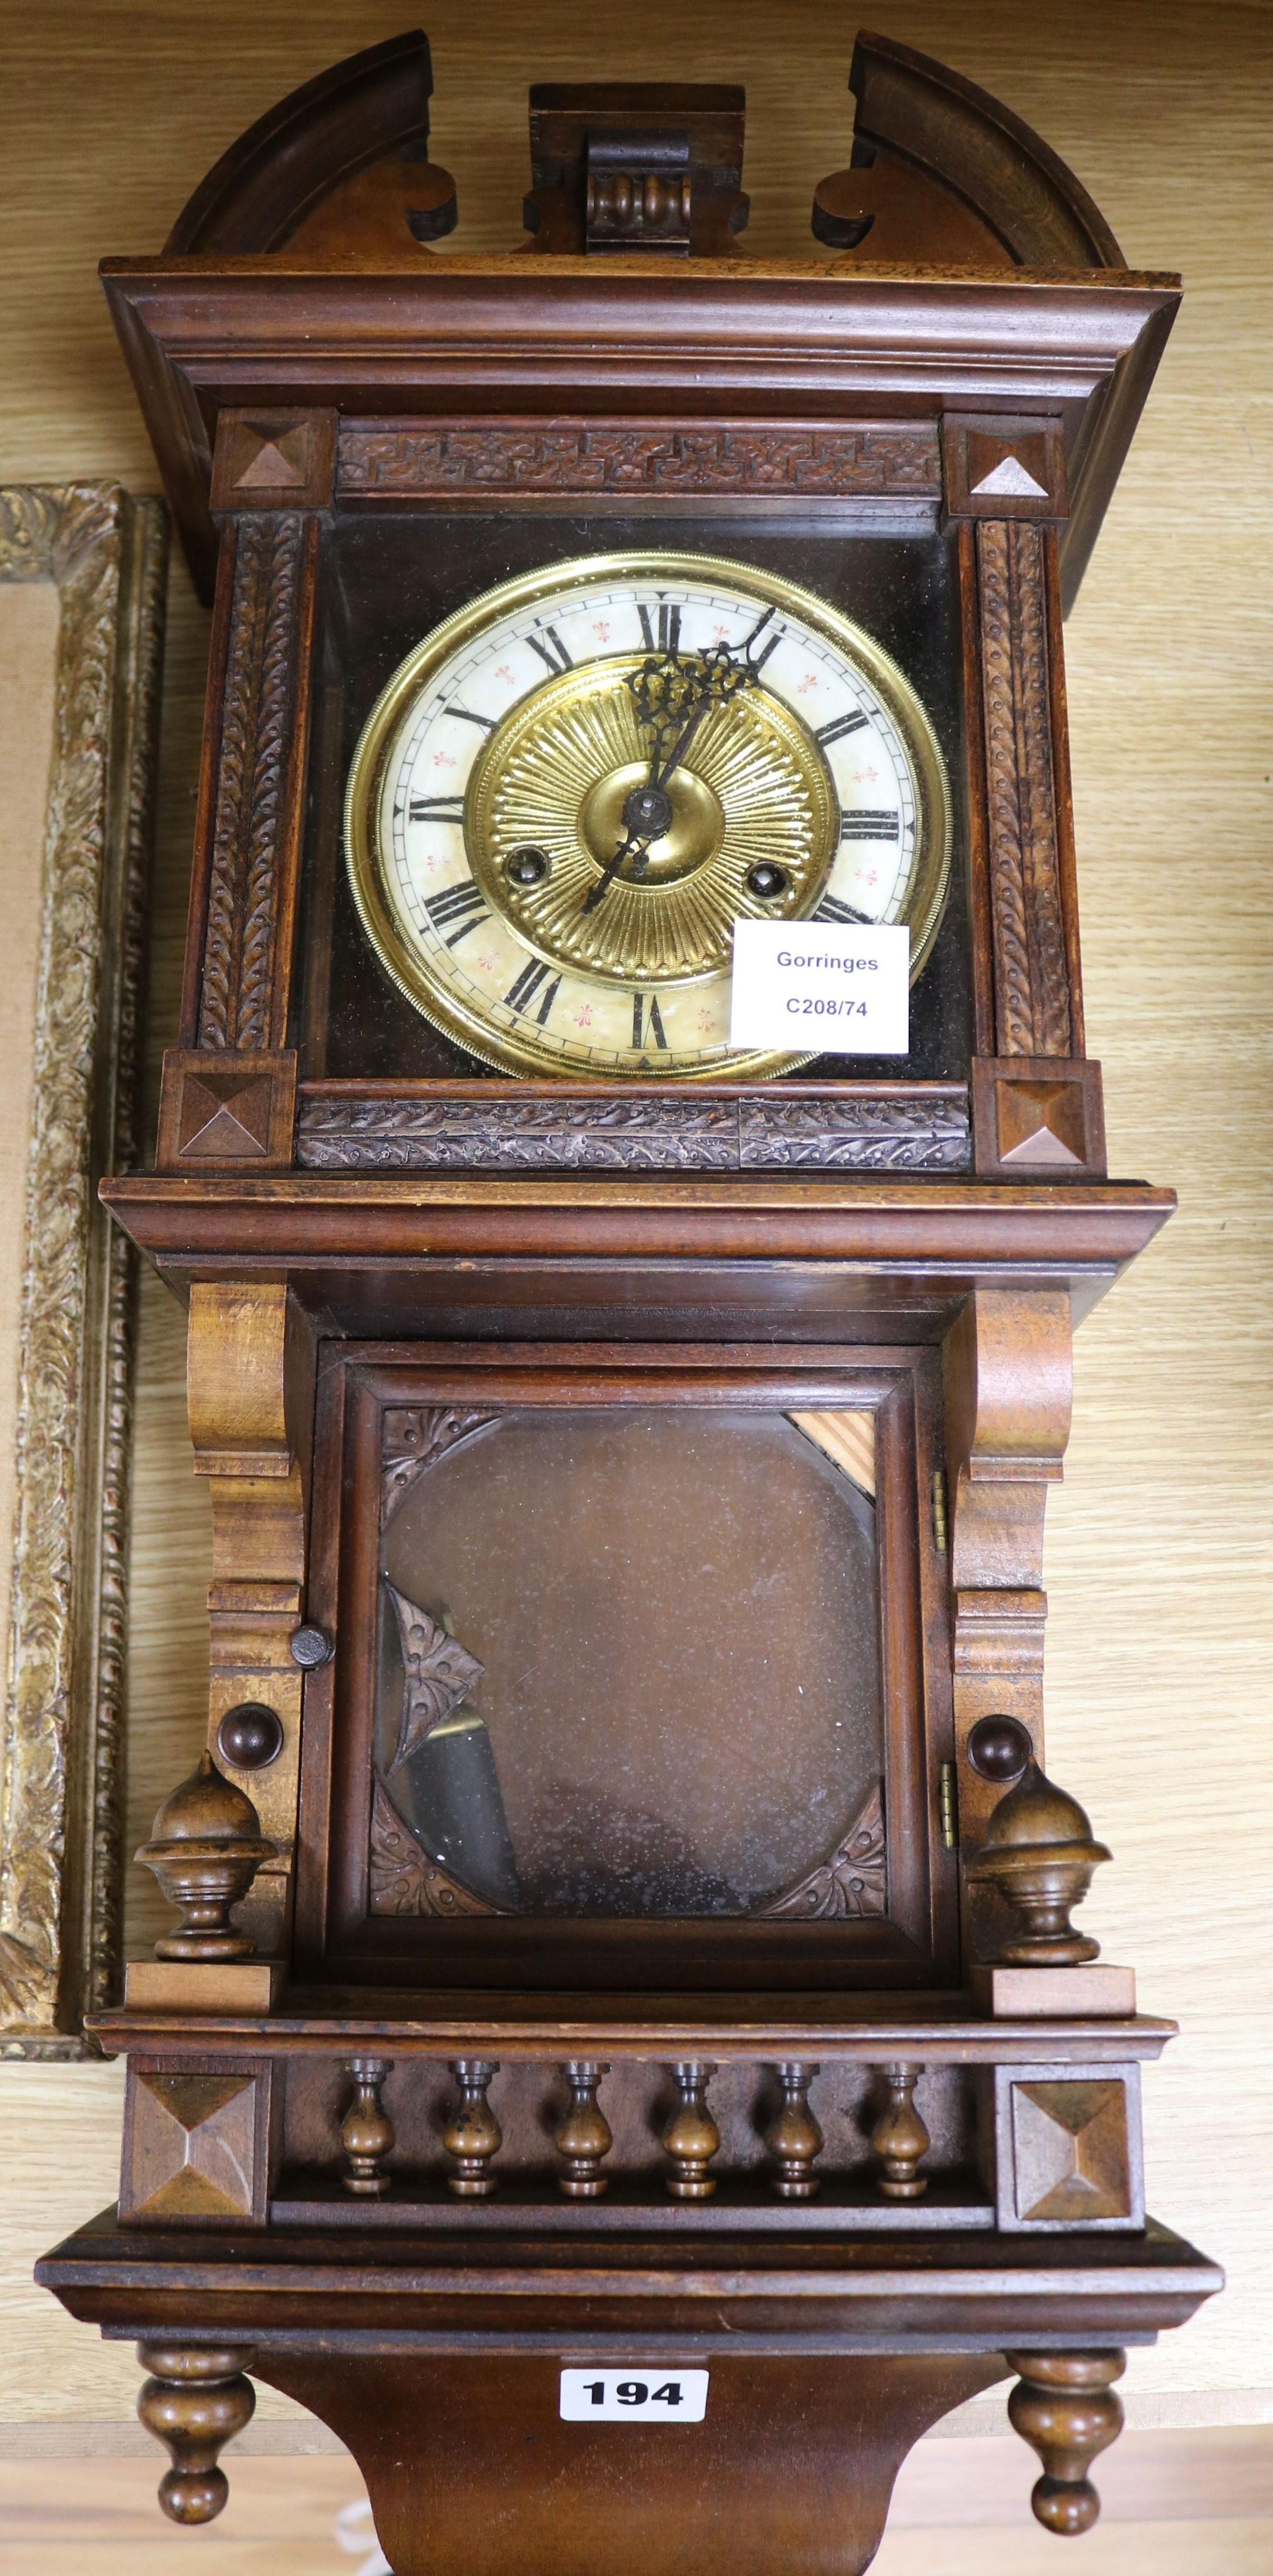 Lot 194 - A late Victorian walnut eight day wall clock